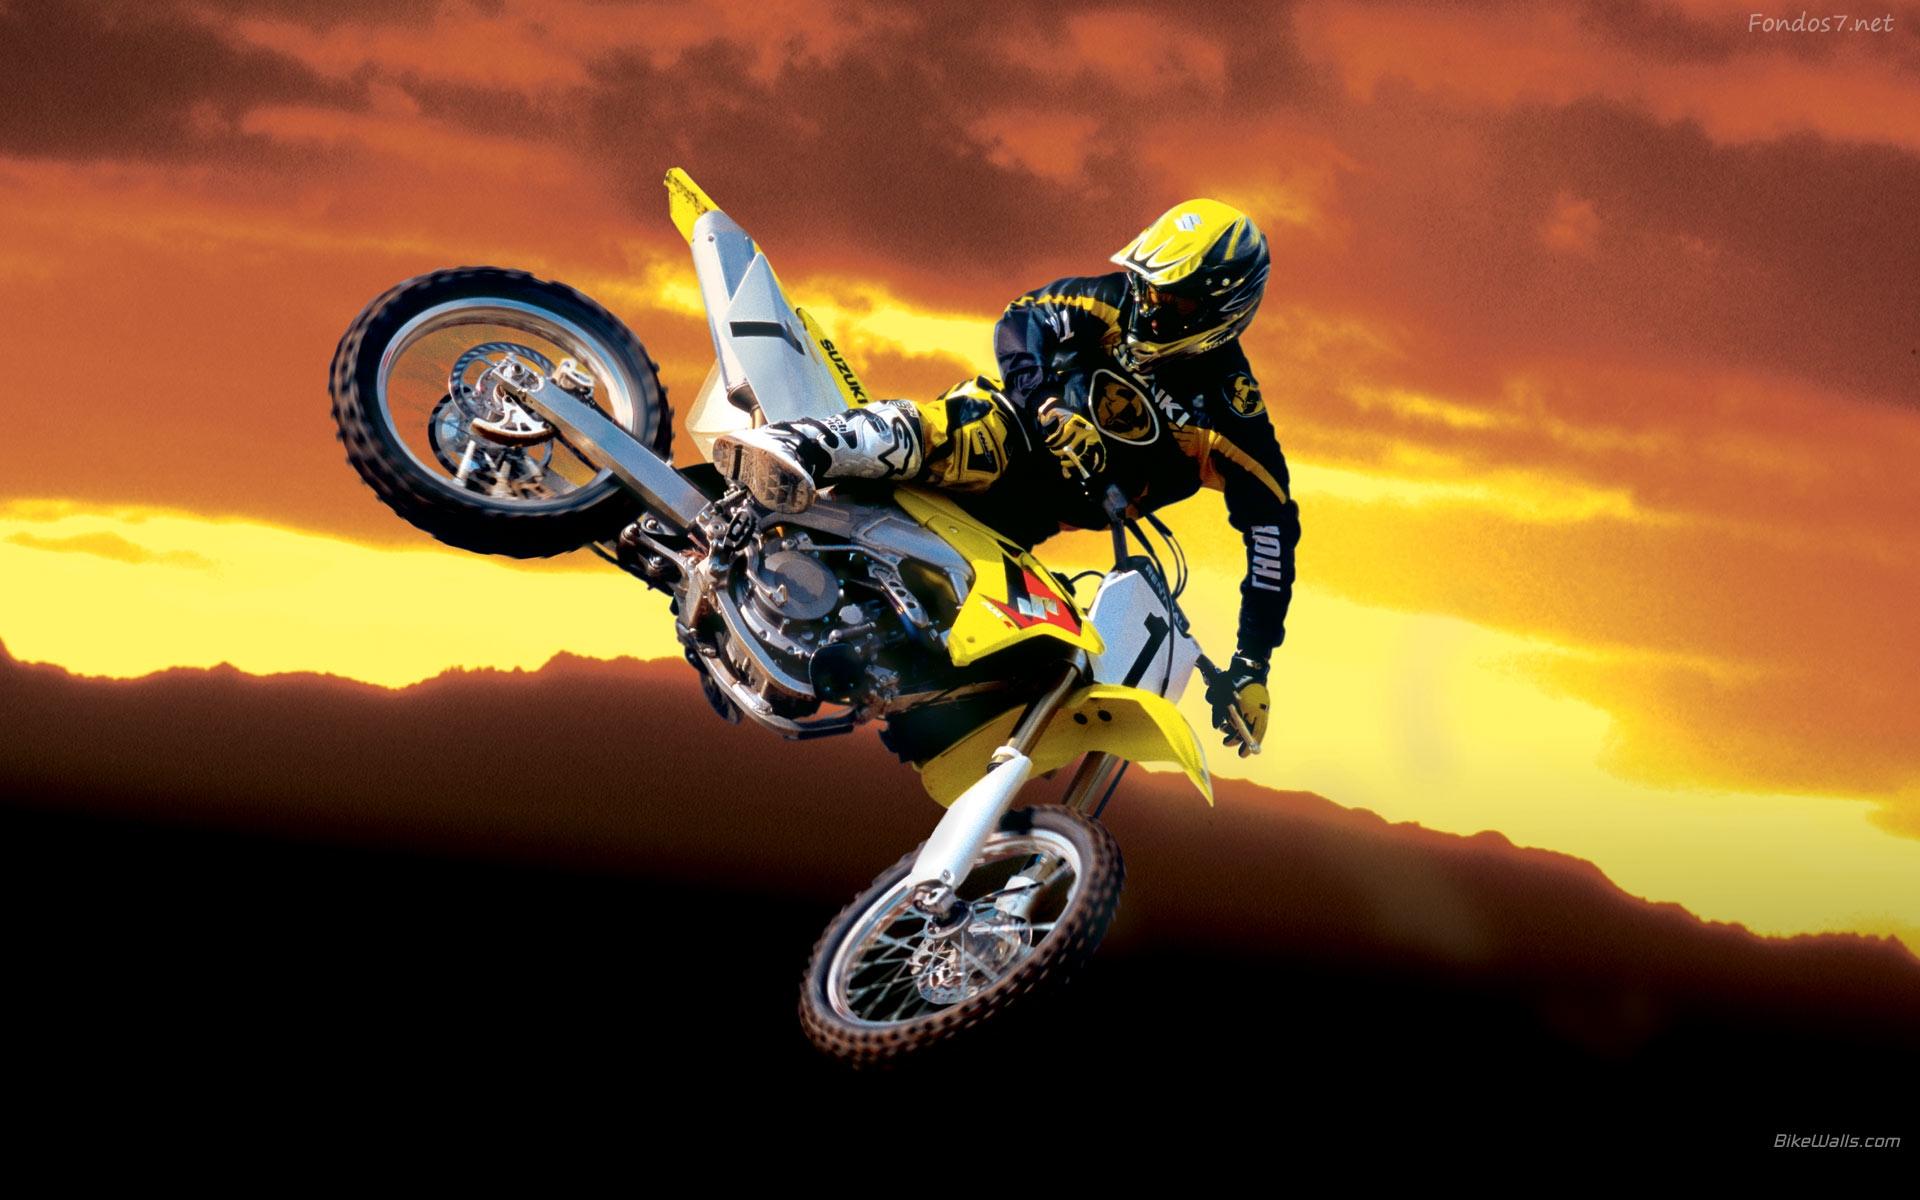 Motocross Wallpaper  1280x720  #4031